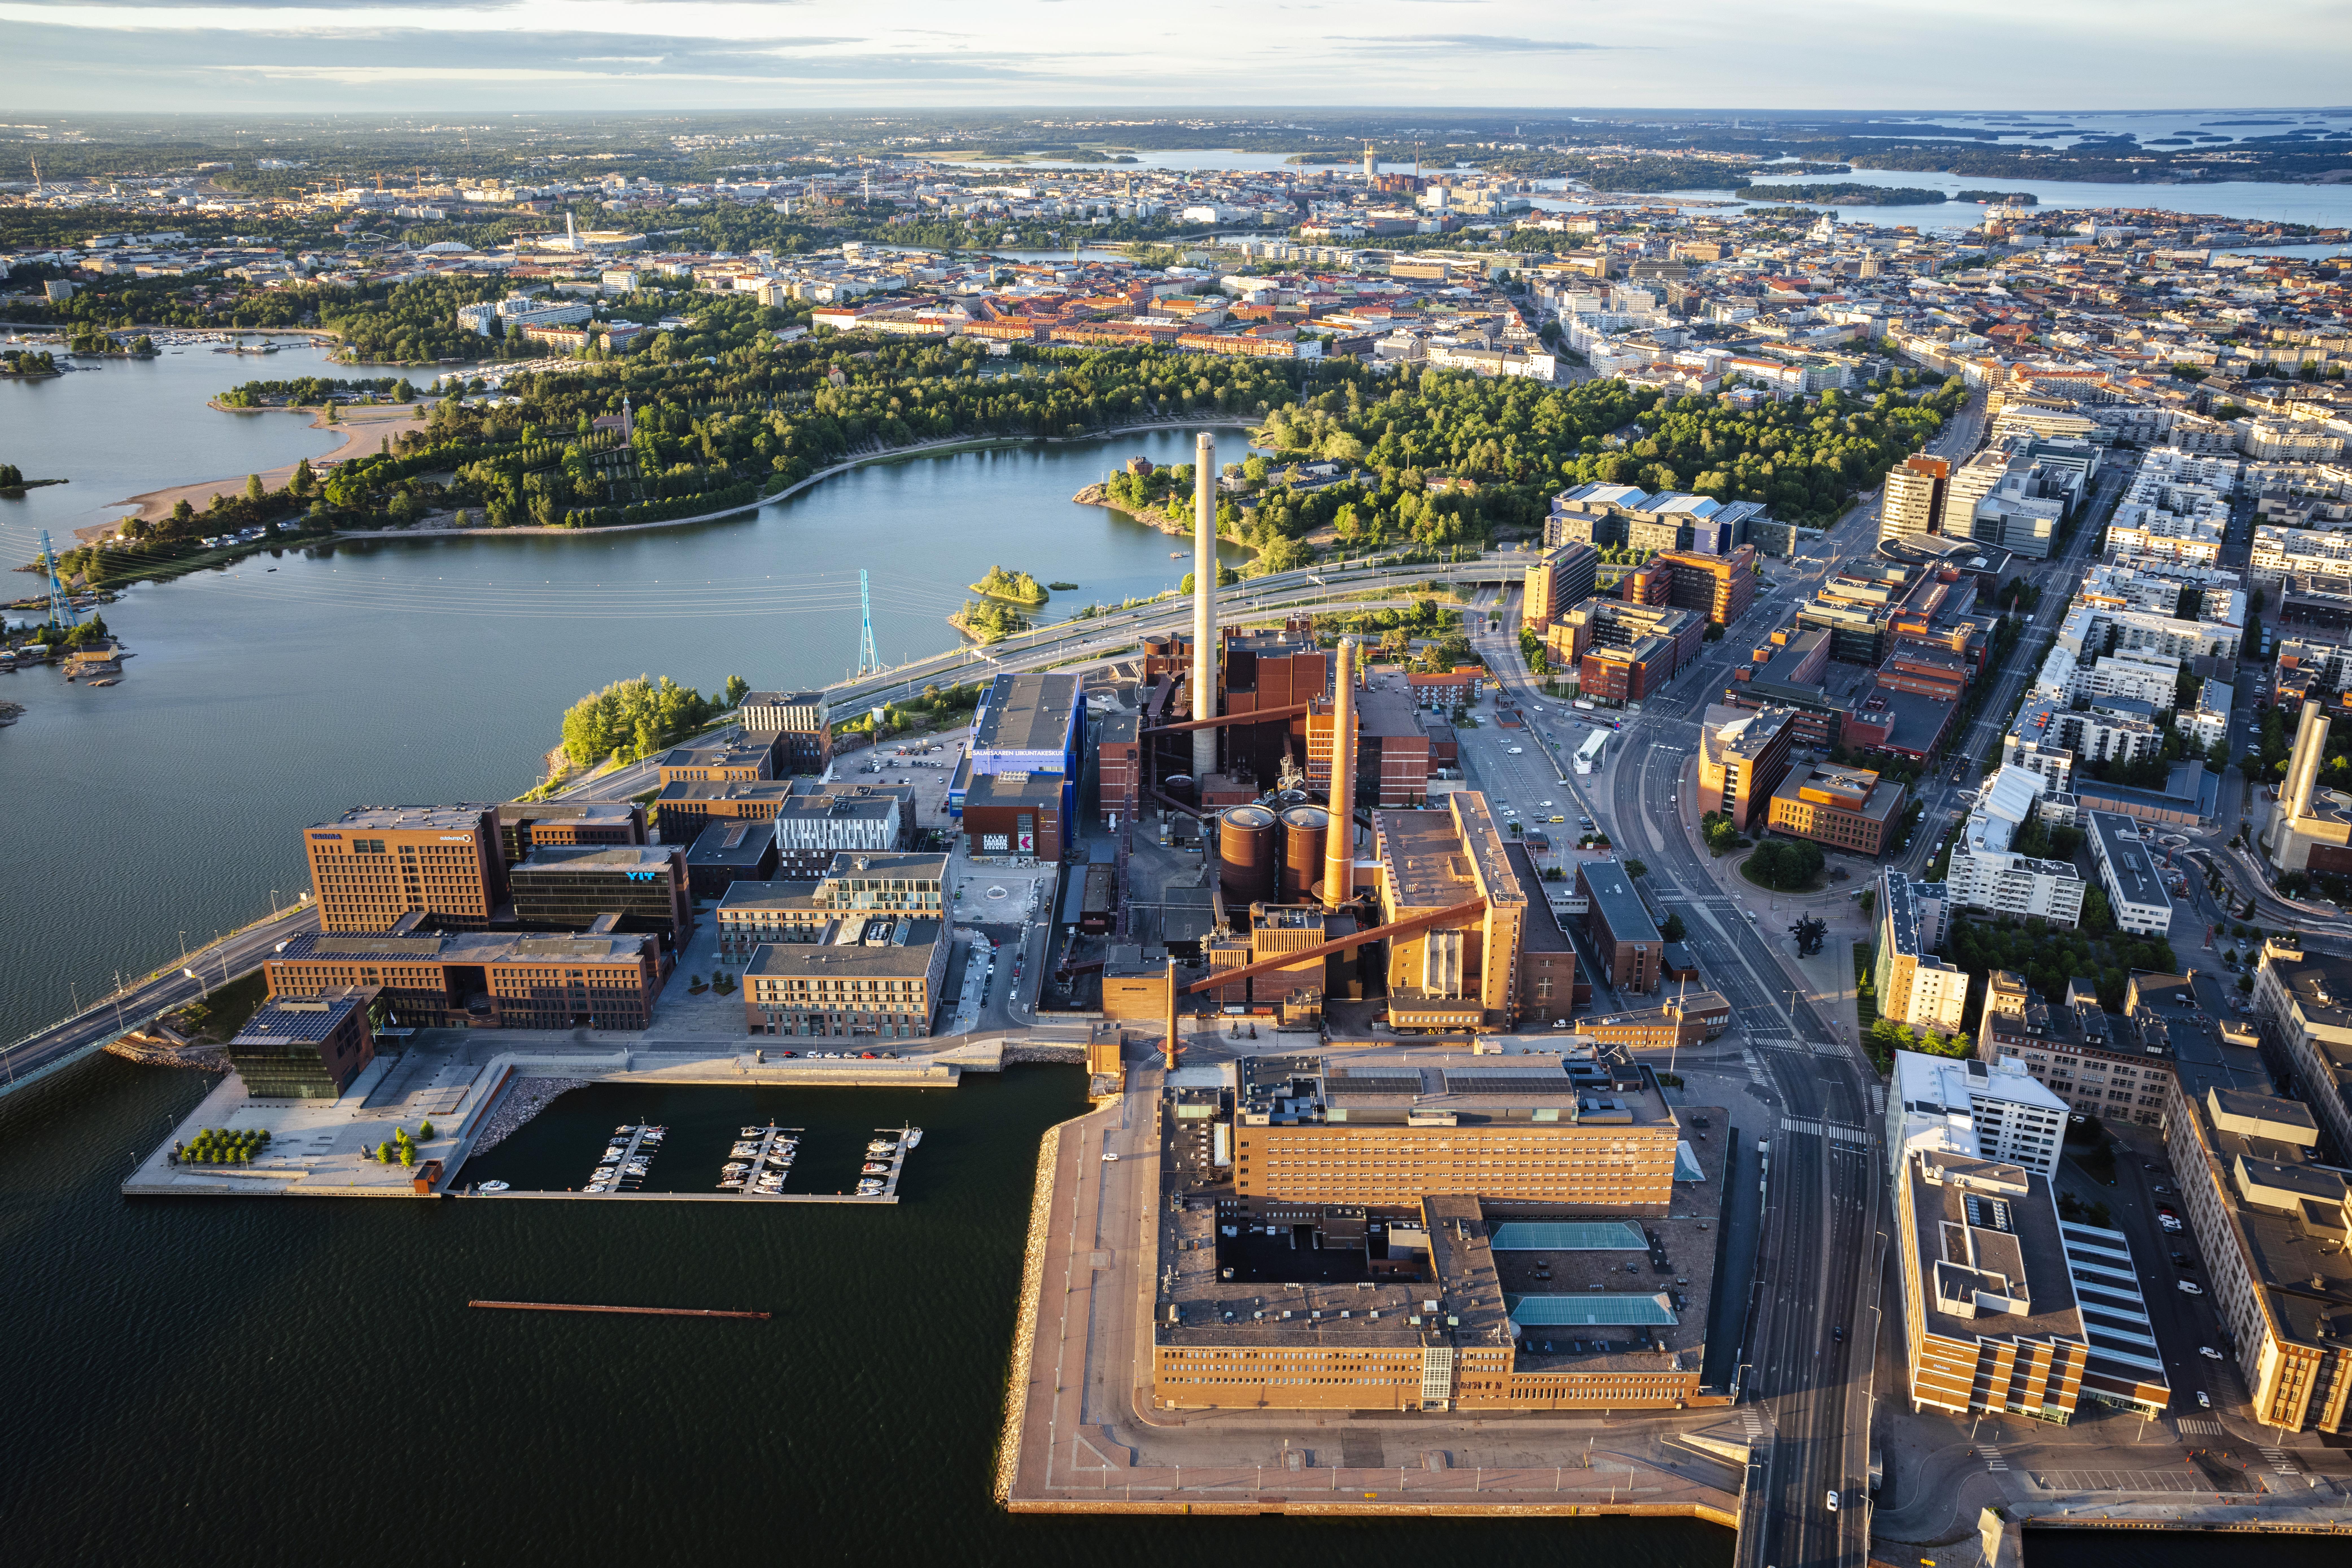 Toimitila, Tallberginkatu 2, Ruoholahti, Helsinki